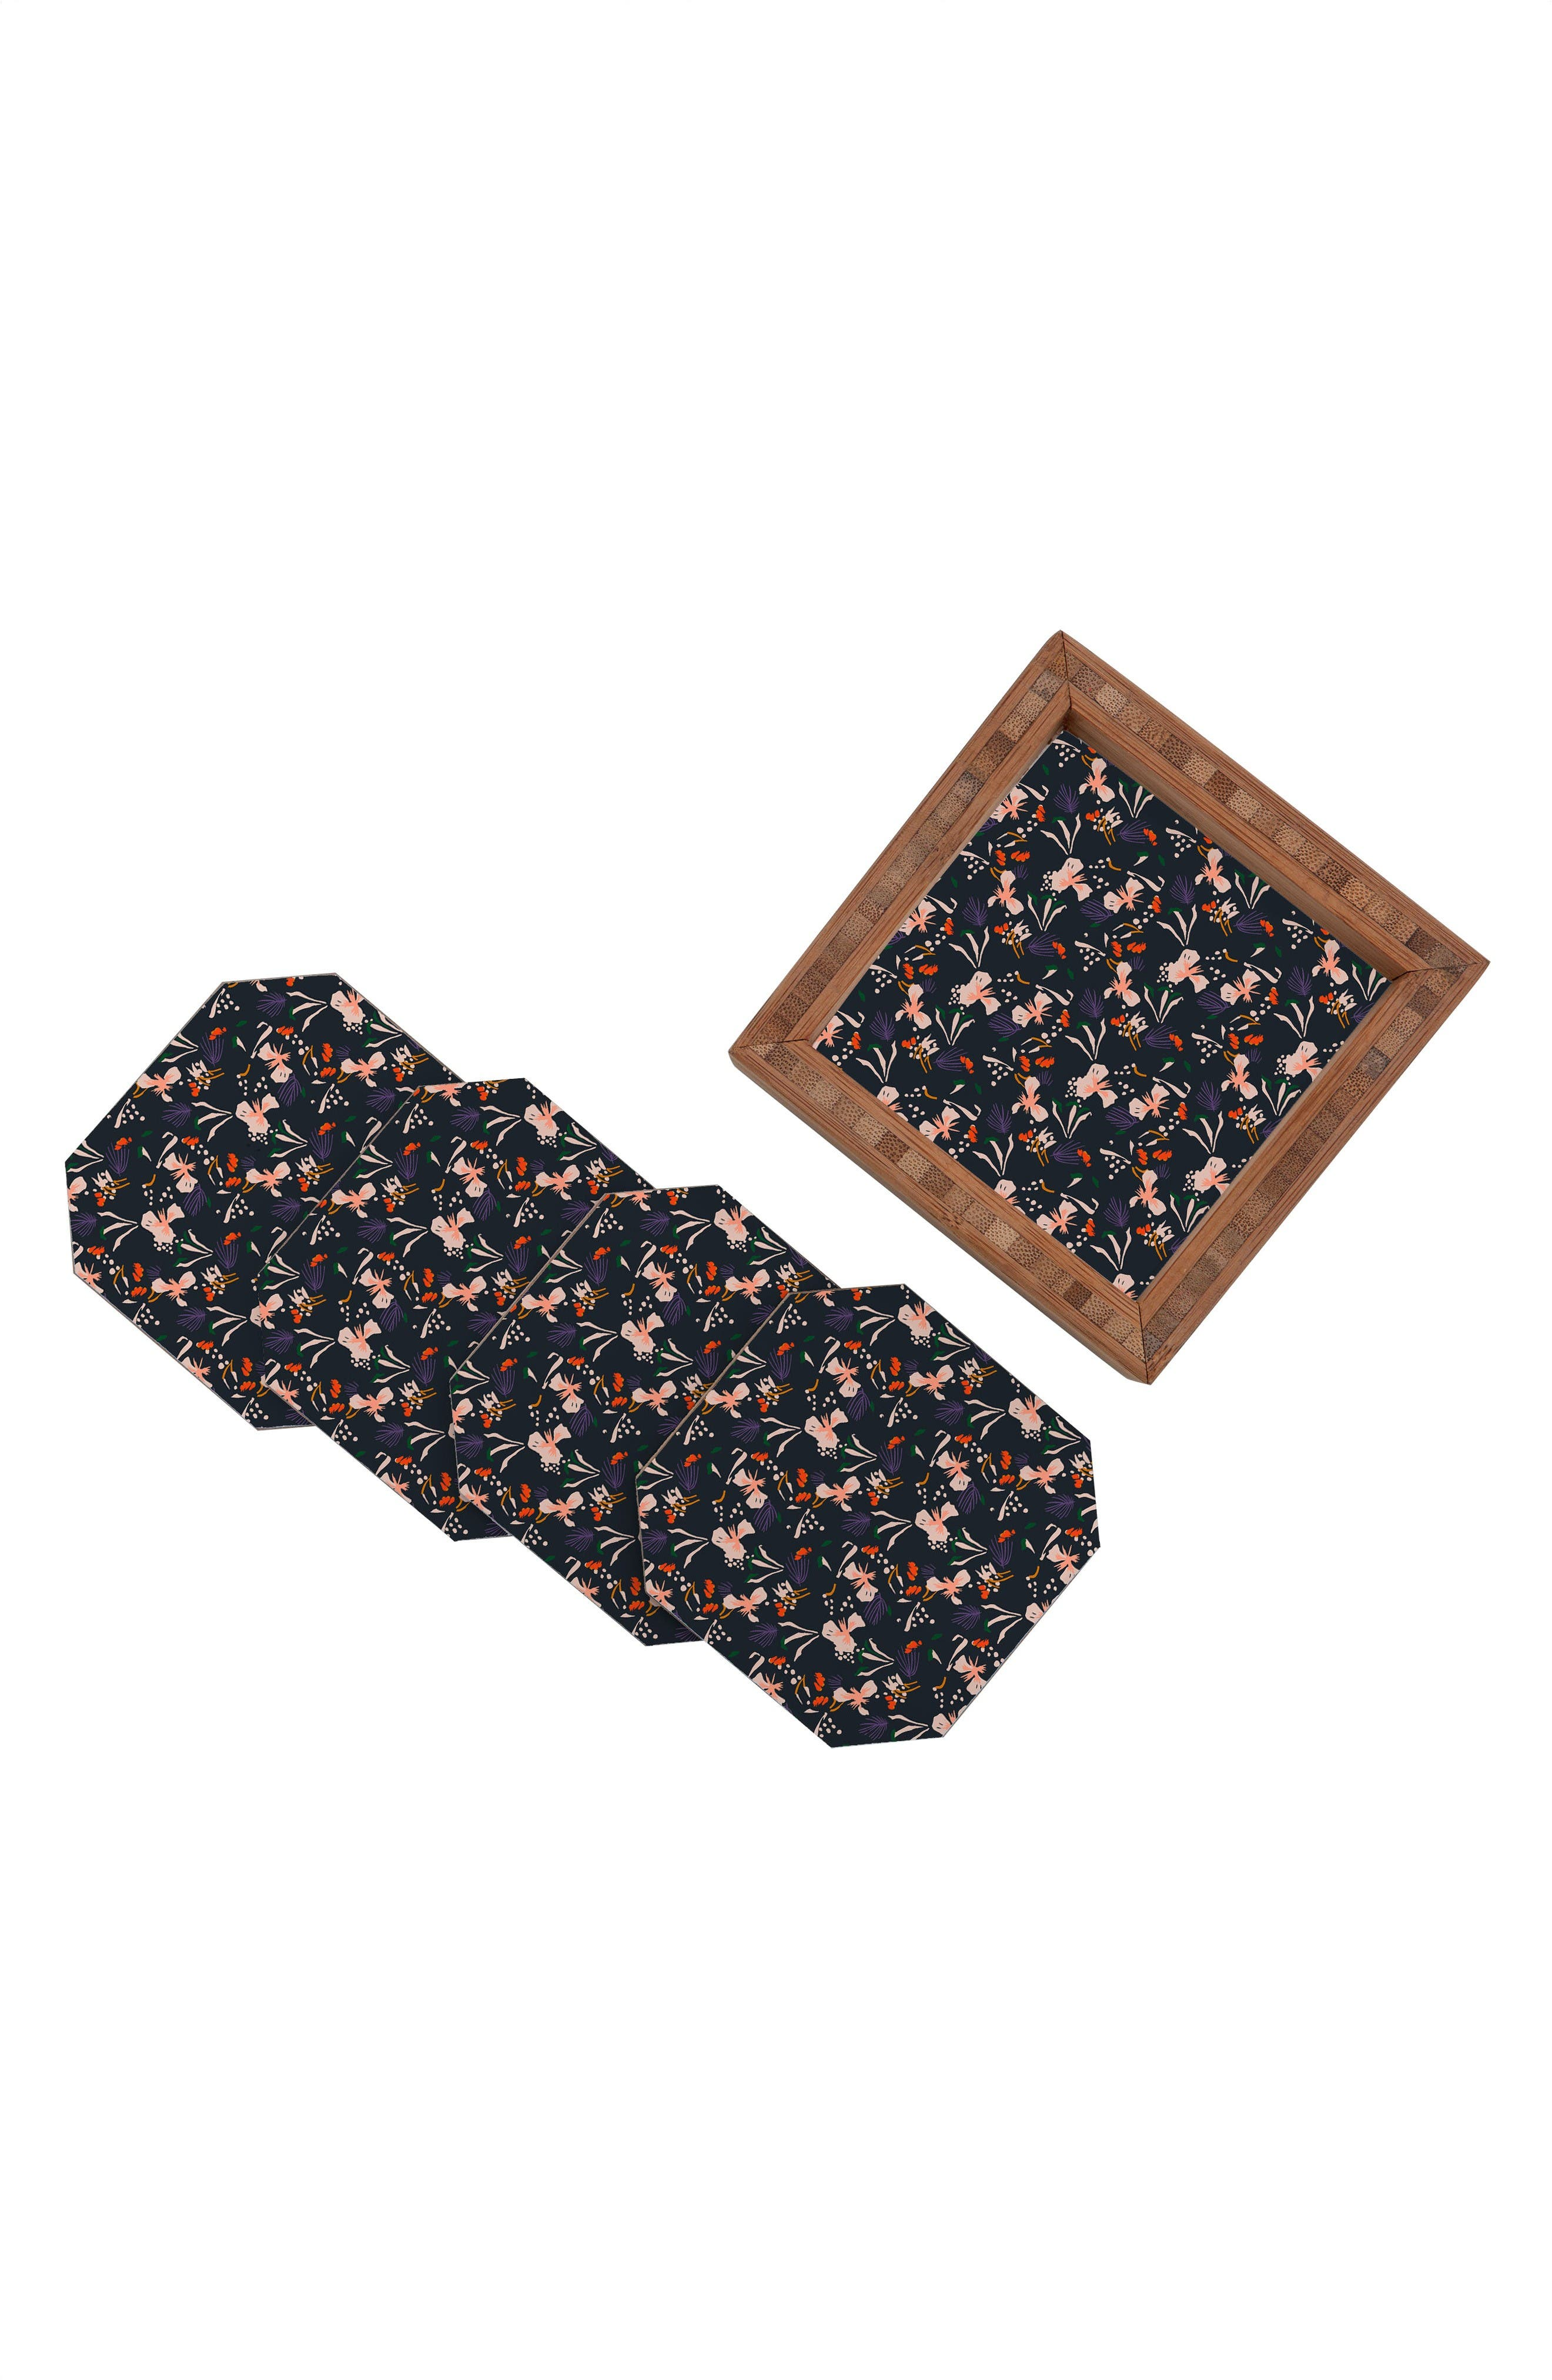 Garden Set of 4 Coasters,                             Alternate thumbnail 2, color,                             Black